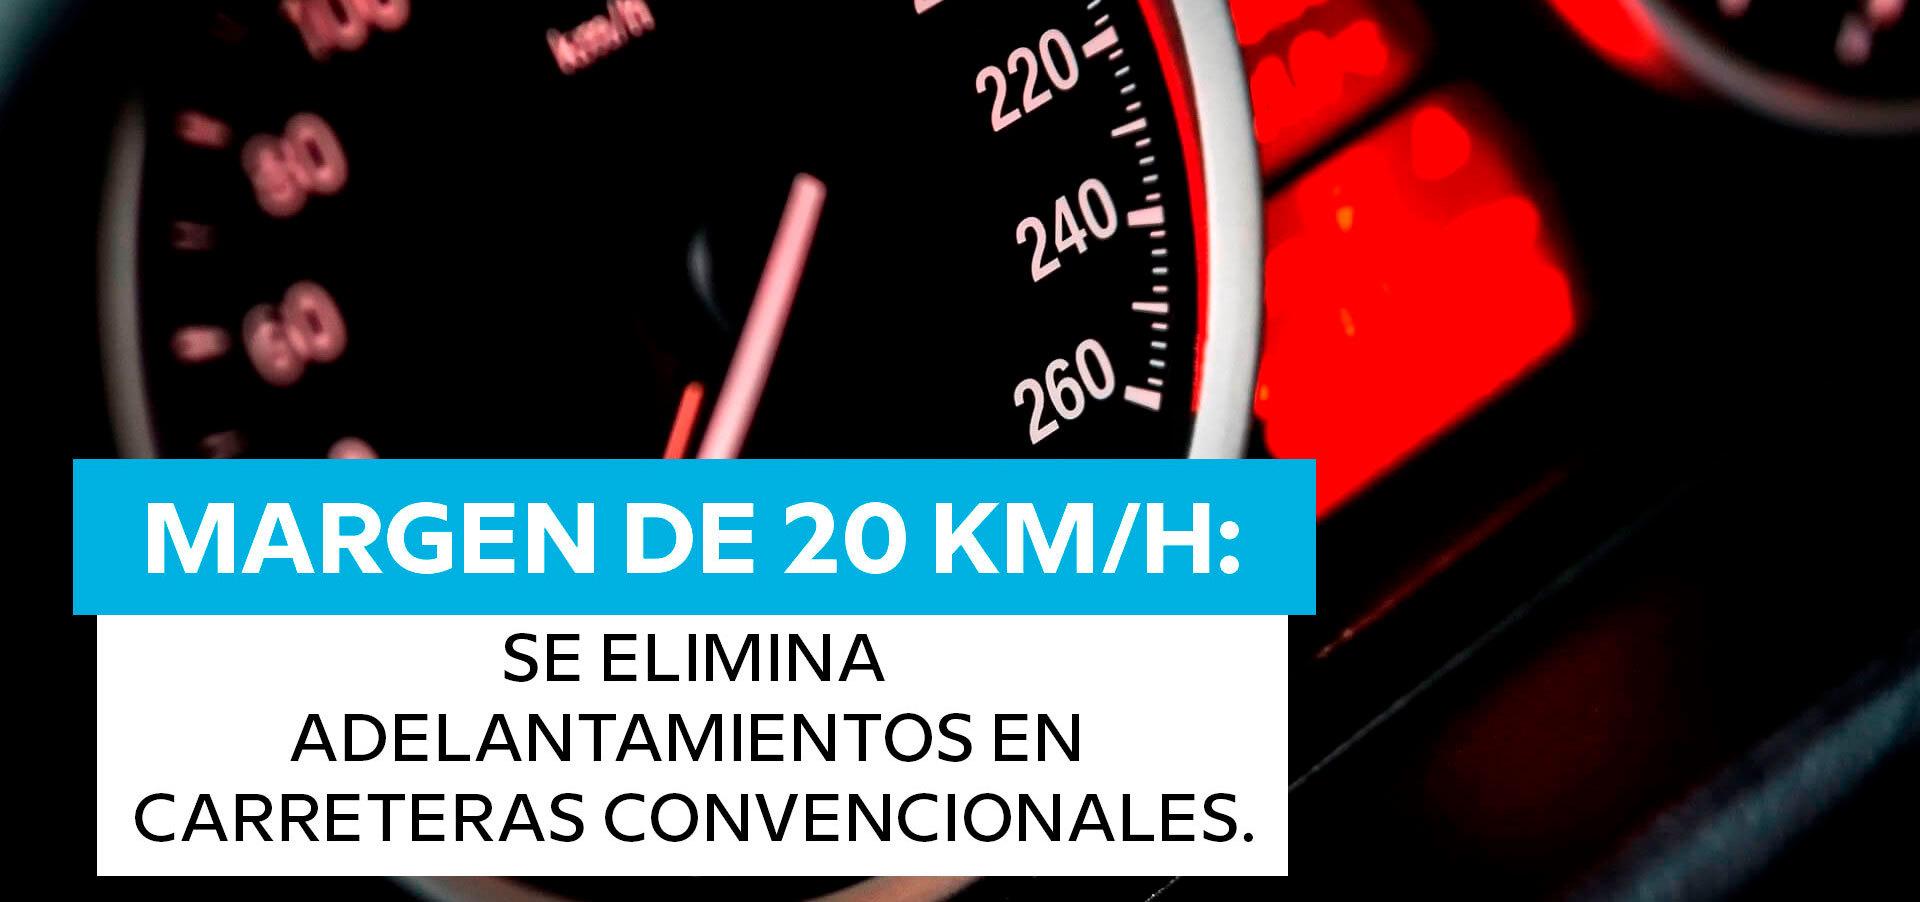 Dgt Reforma 2021 Margen 20 Kmh 2